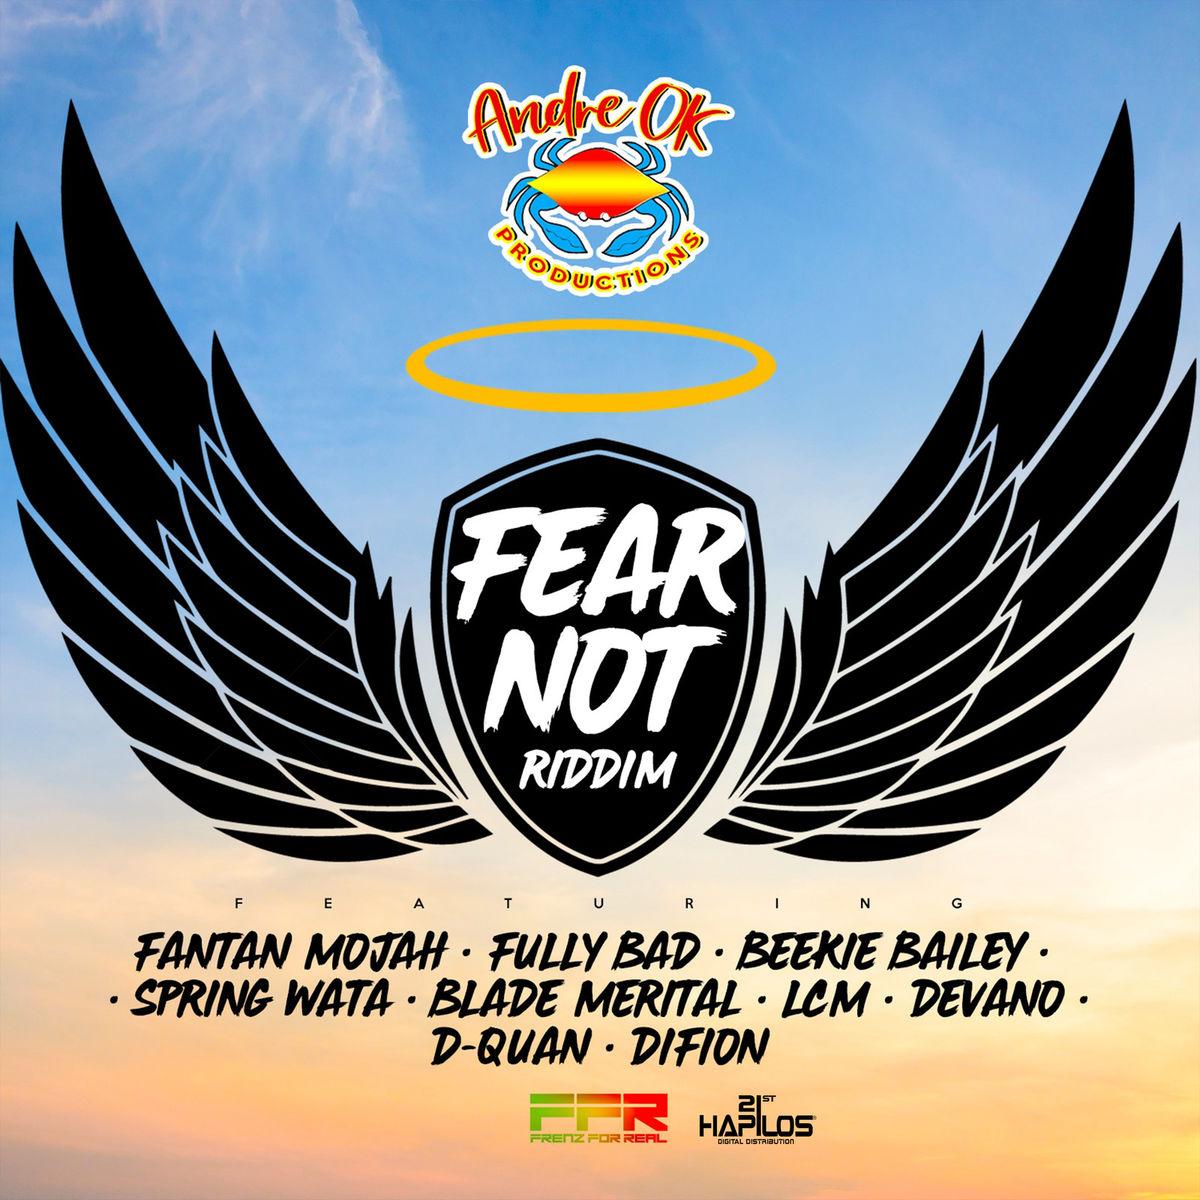 FEAR NOT RIDDIM (REGGAE) - ANDREOKPRODUCTION - 2018 ~ Reggae